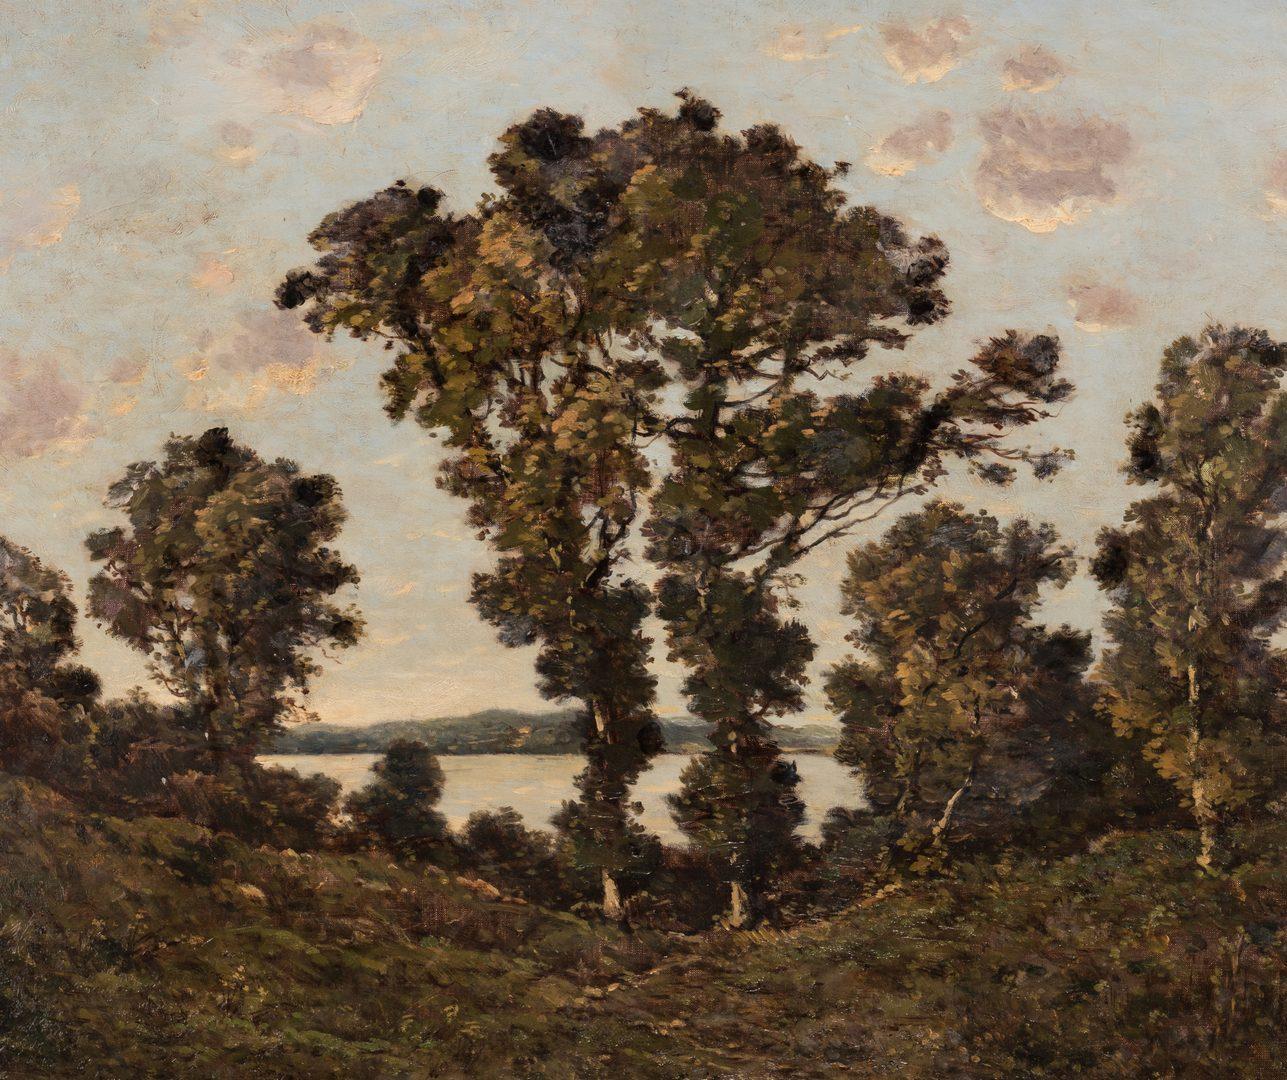 Lot 98: Henri-Joseph Harpignies, O/C, River Landscape